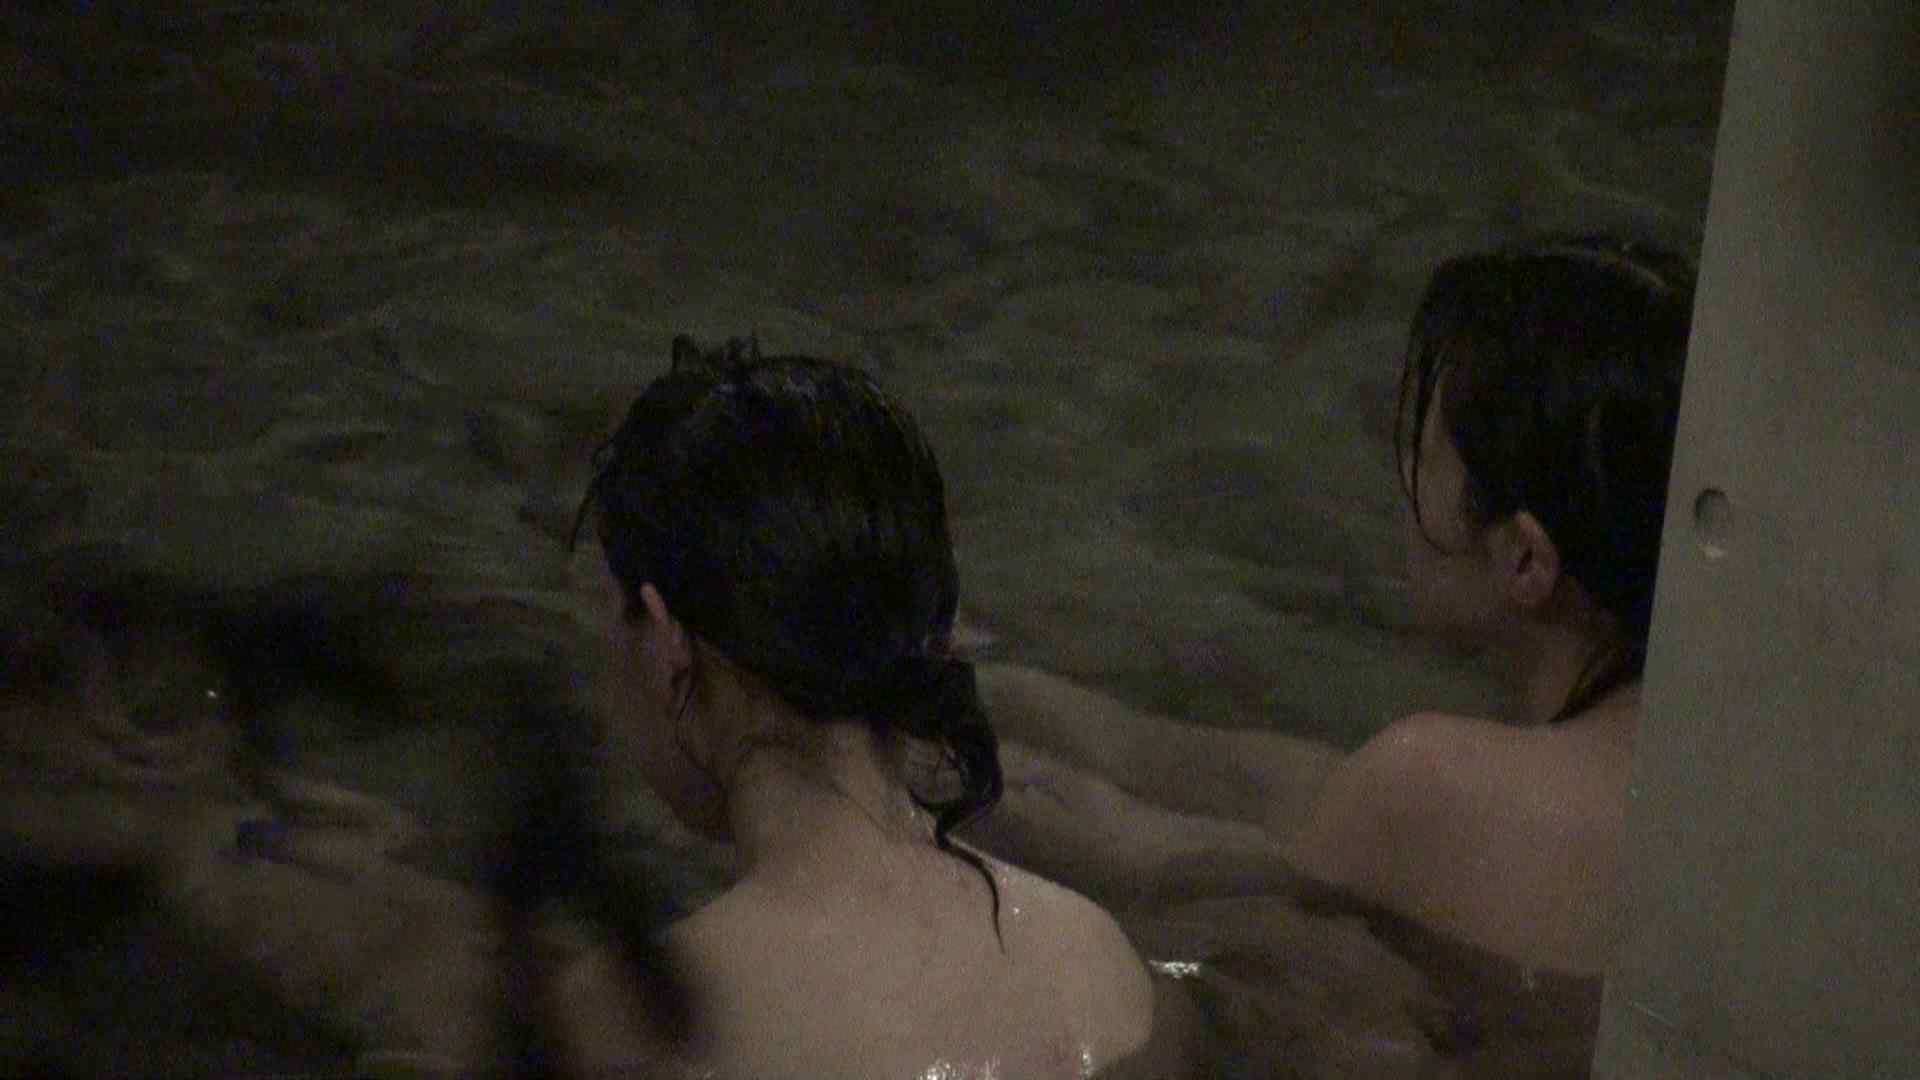 Aquaな露天風呂Vol.402 盗撮シリーズ | 露天風呂編  88PIX 45